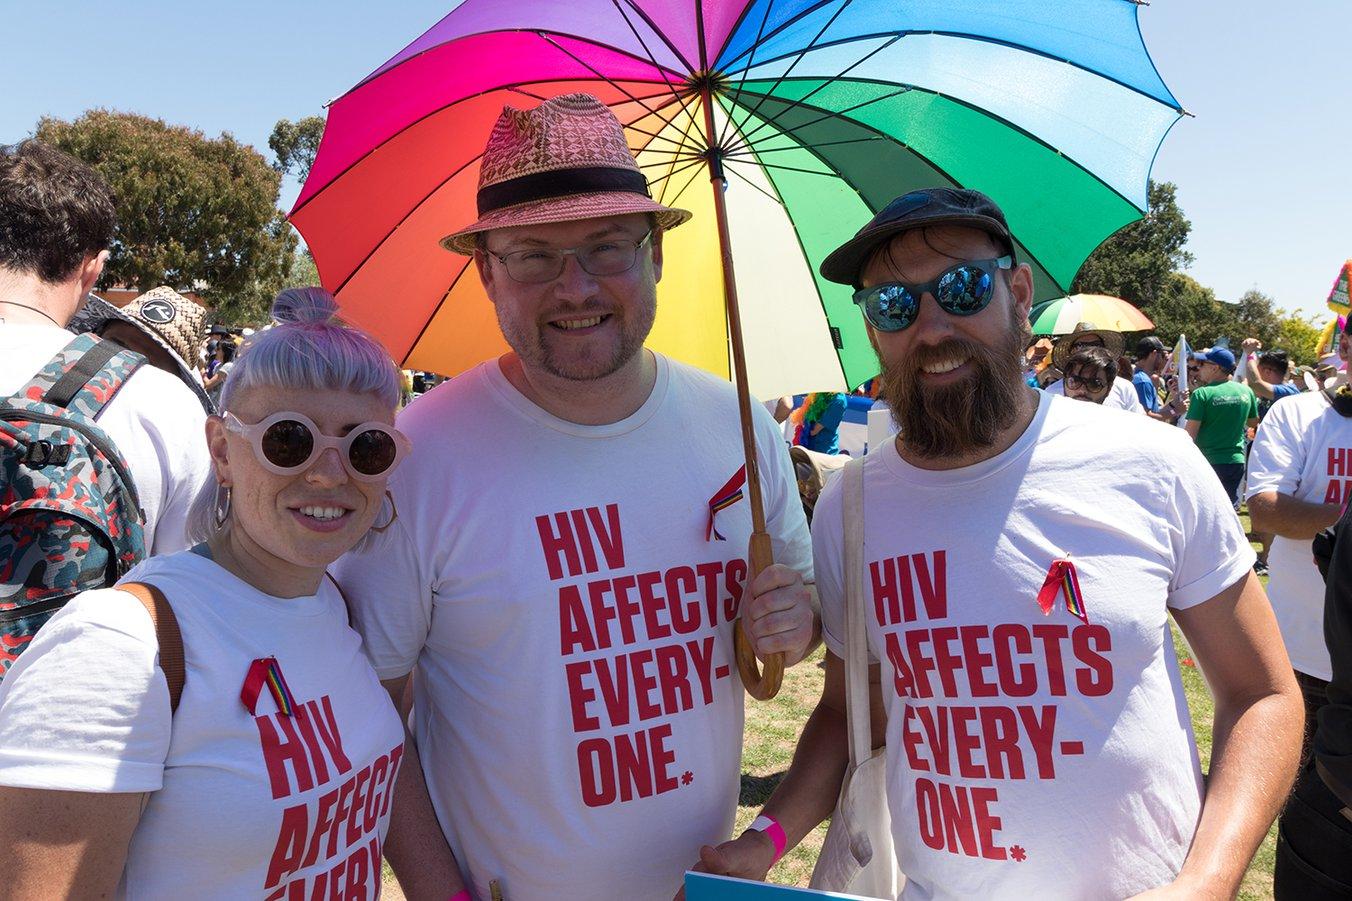 20170202_Pride March_Paul Rees_RE-SIZED_012.jpg